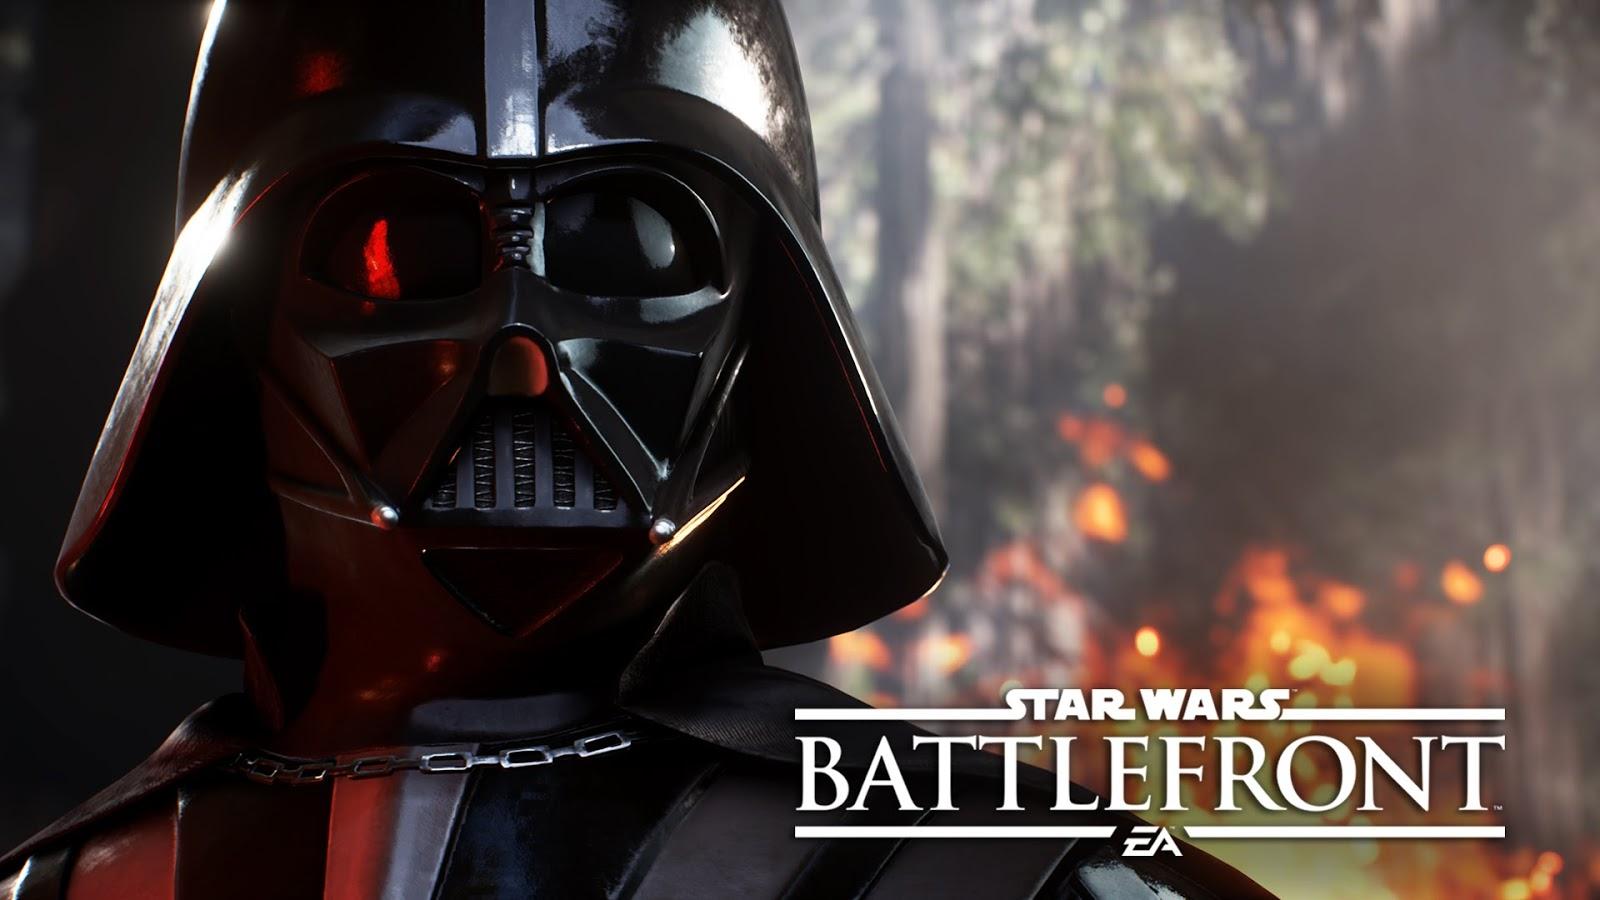 star wars battle front guide